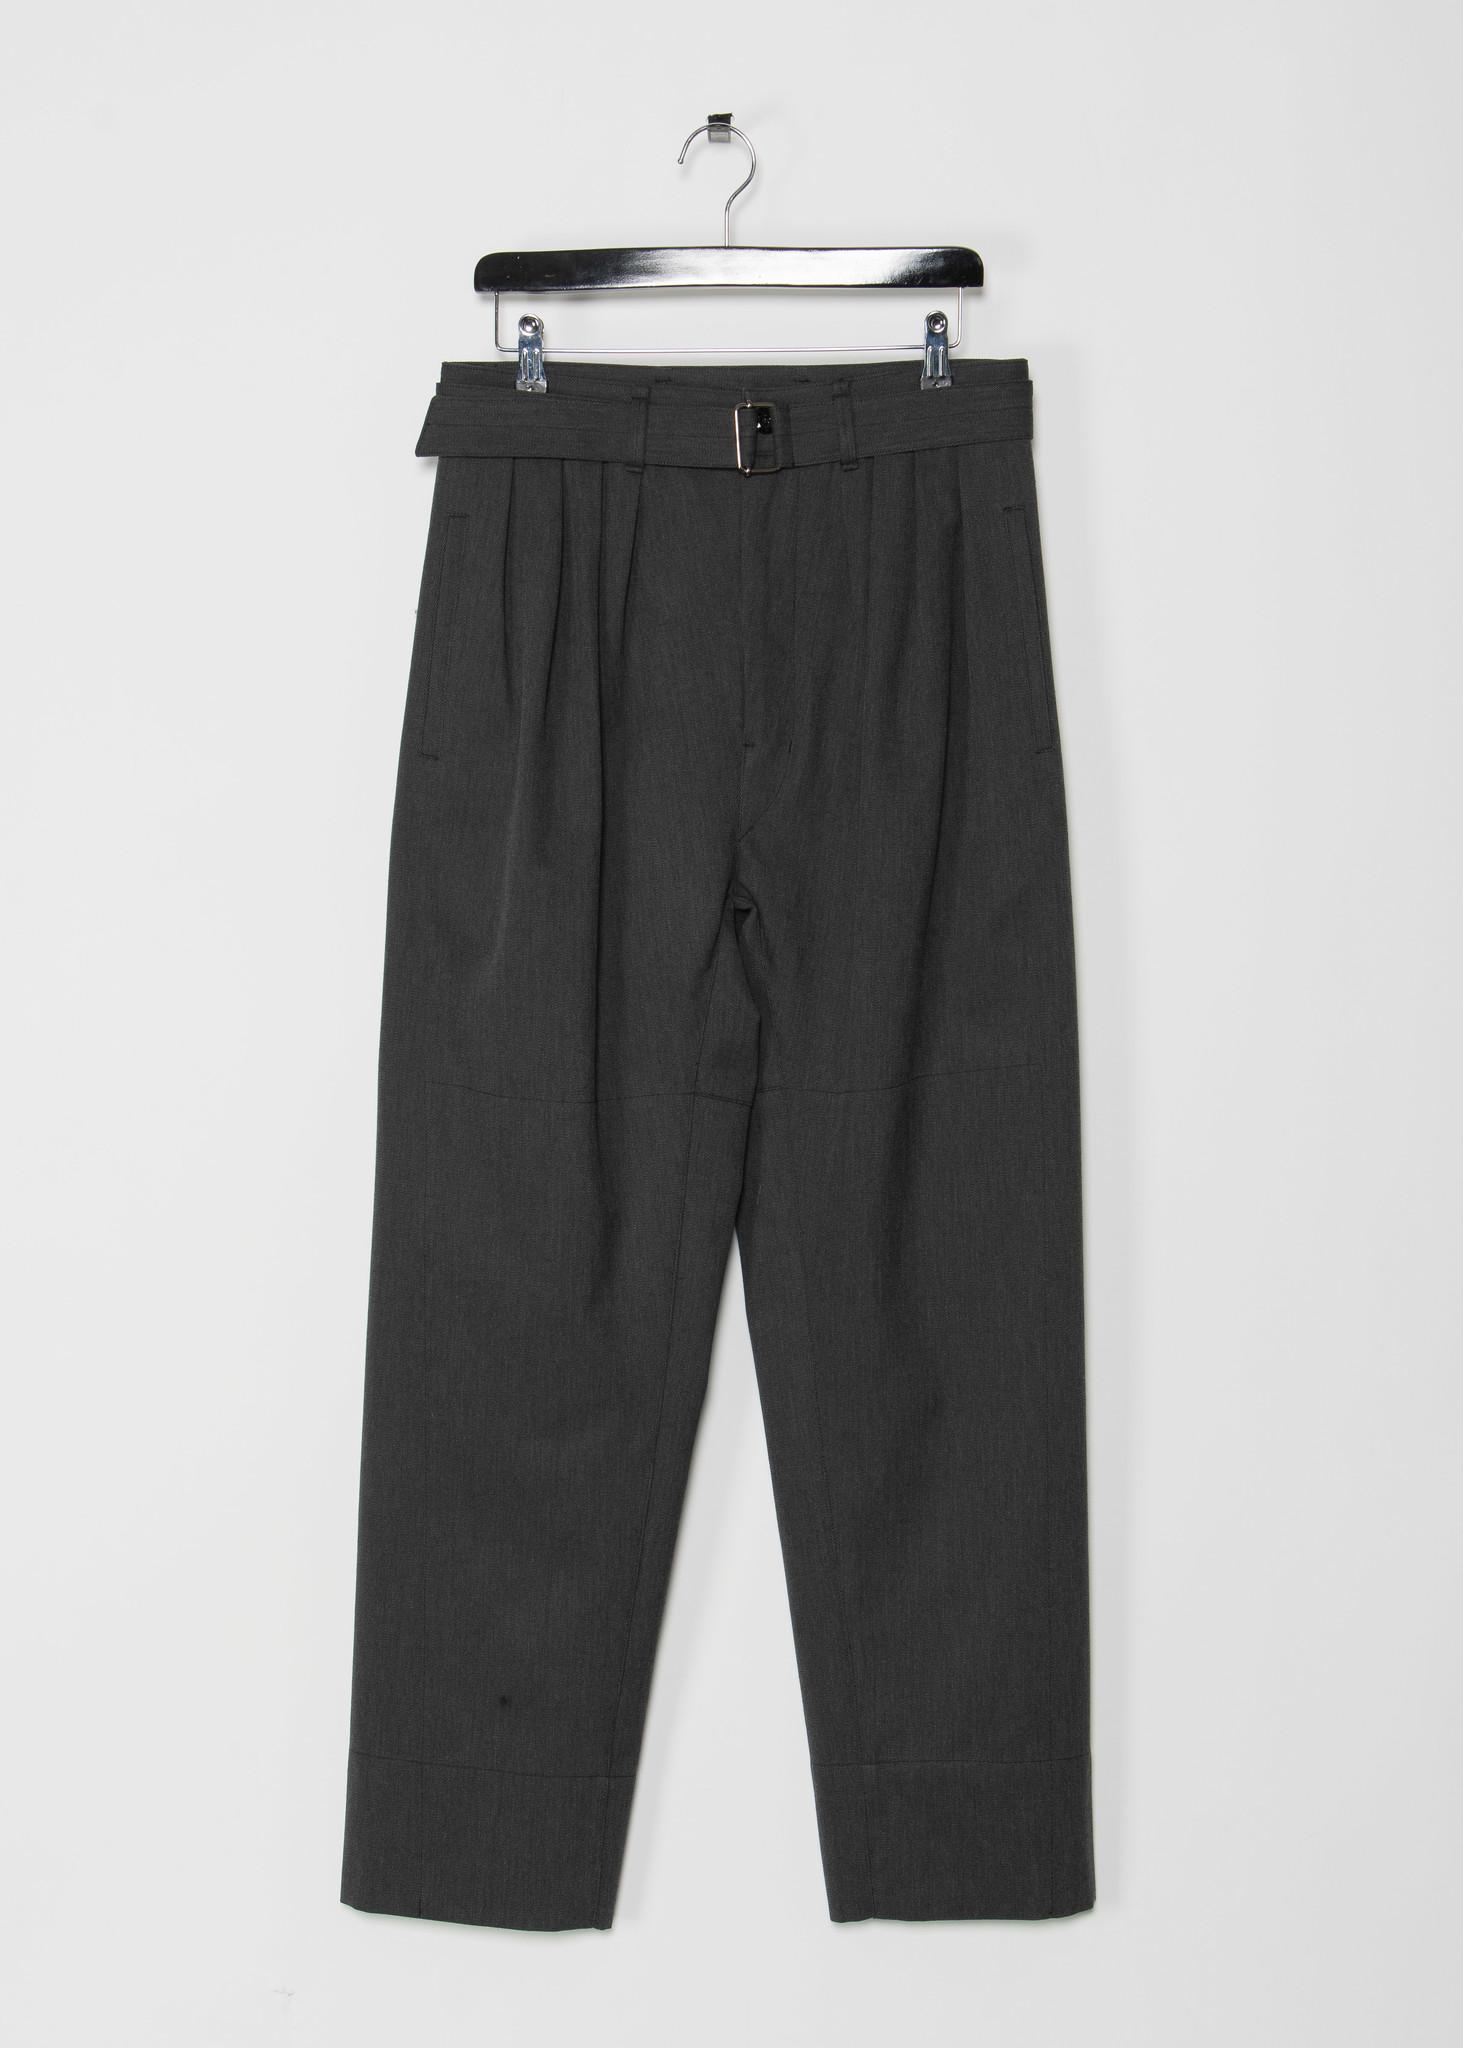 Pantalon 4 Pleats Anthracite